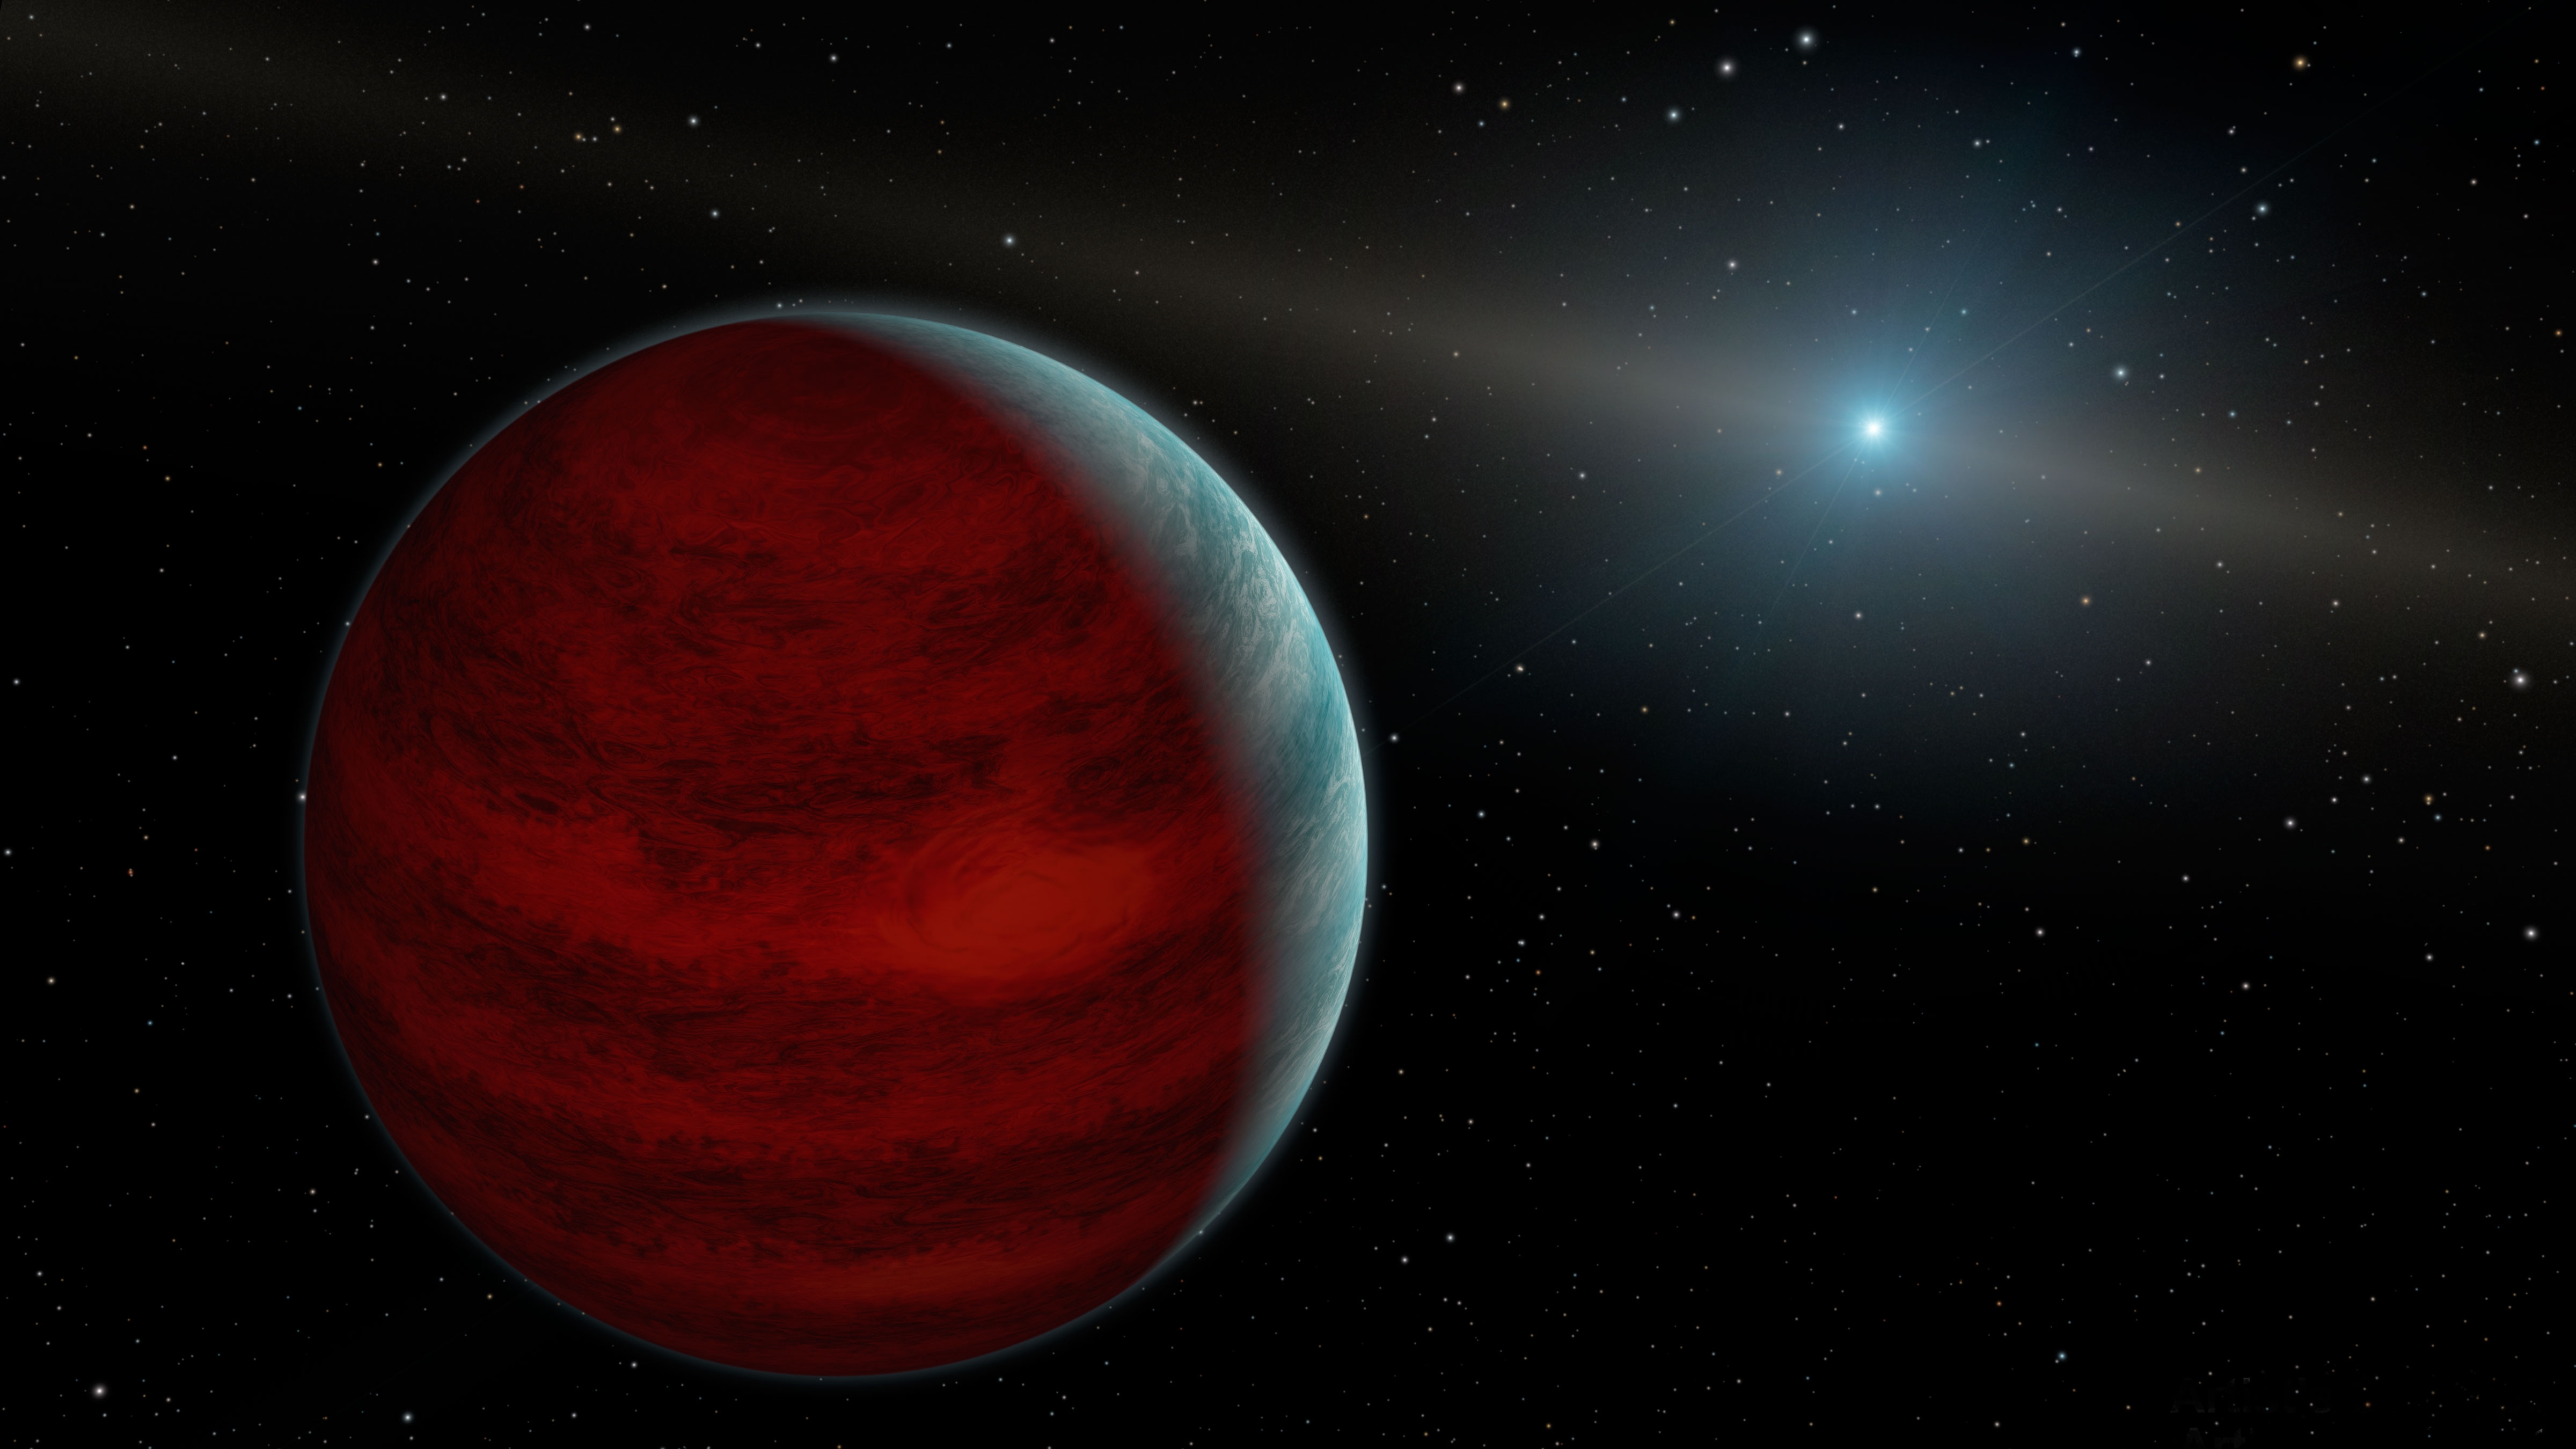 Artist's concept or a rejuvenated planet. Credit: NASA/JPL-Caltech